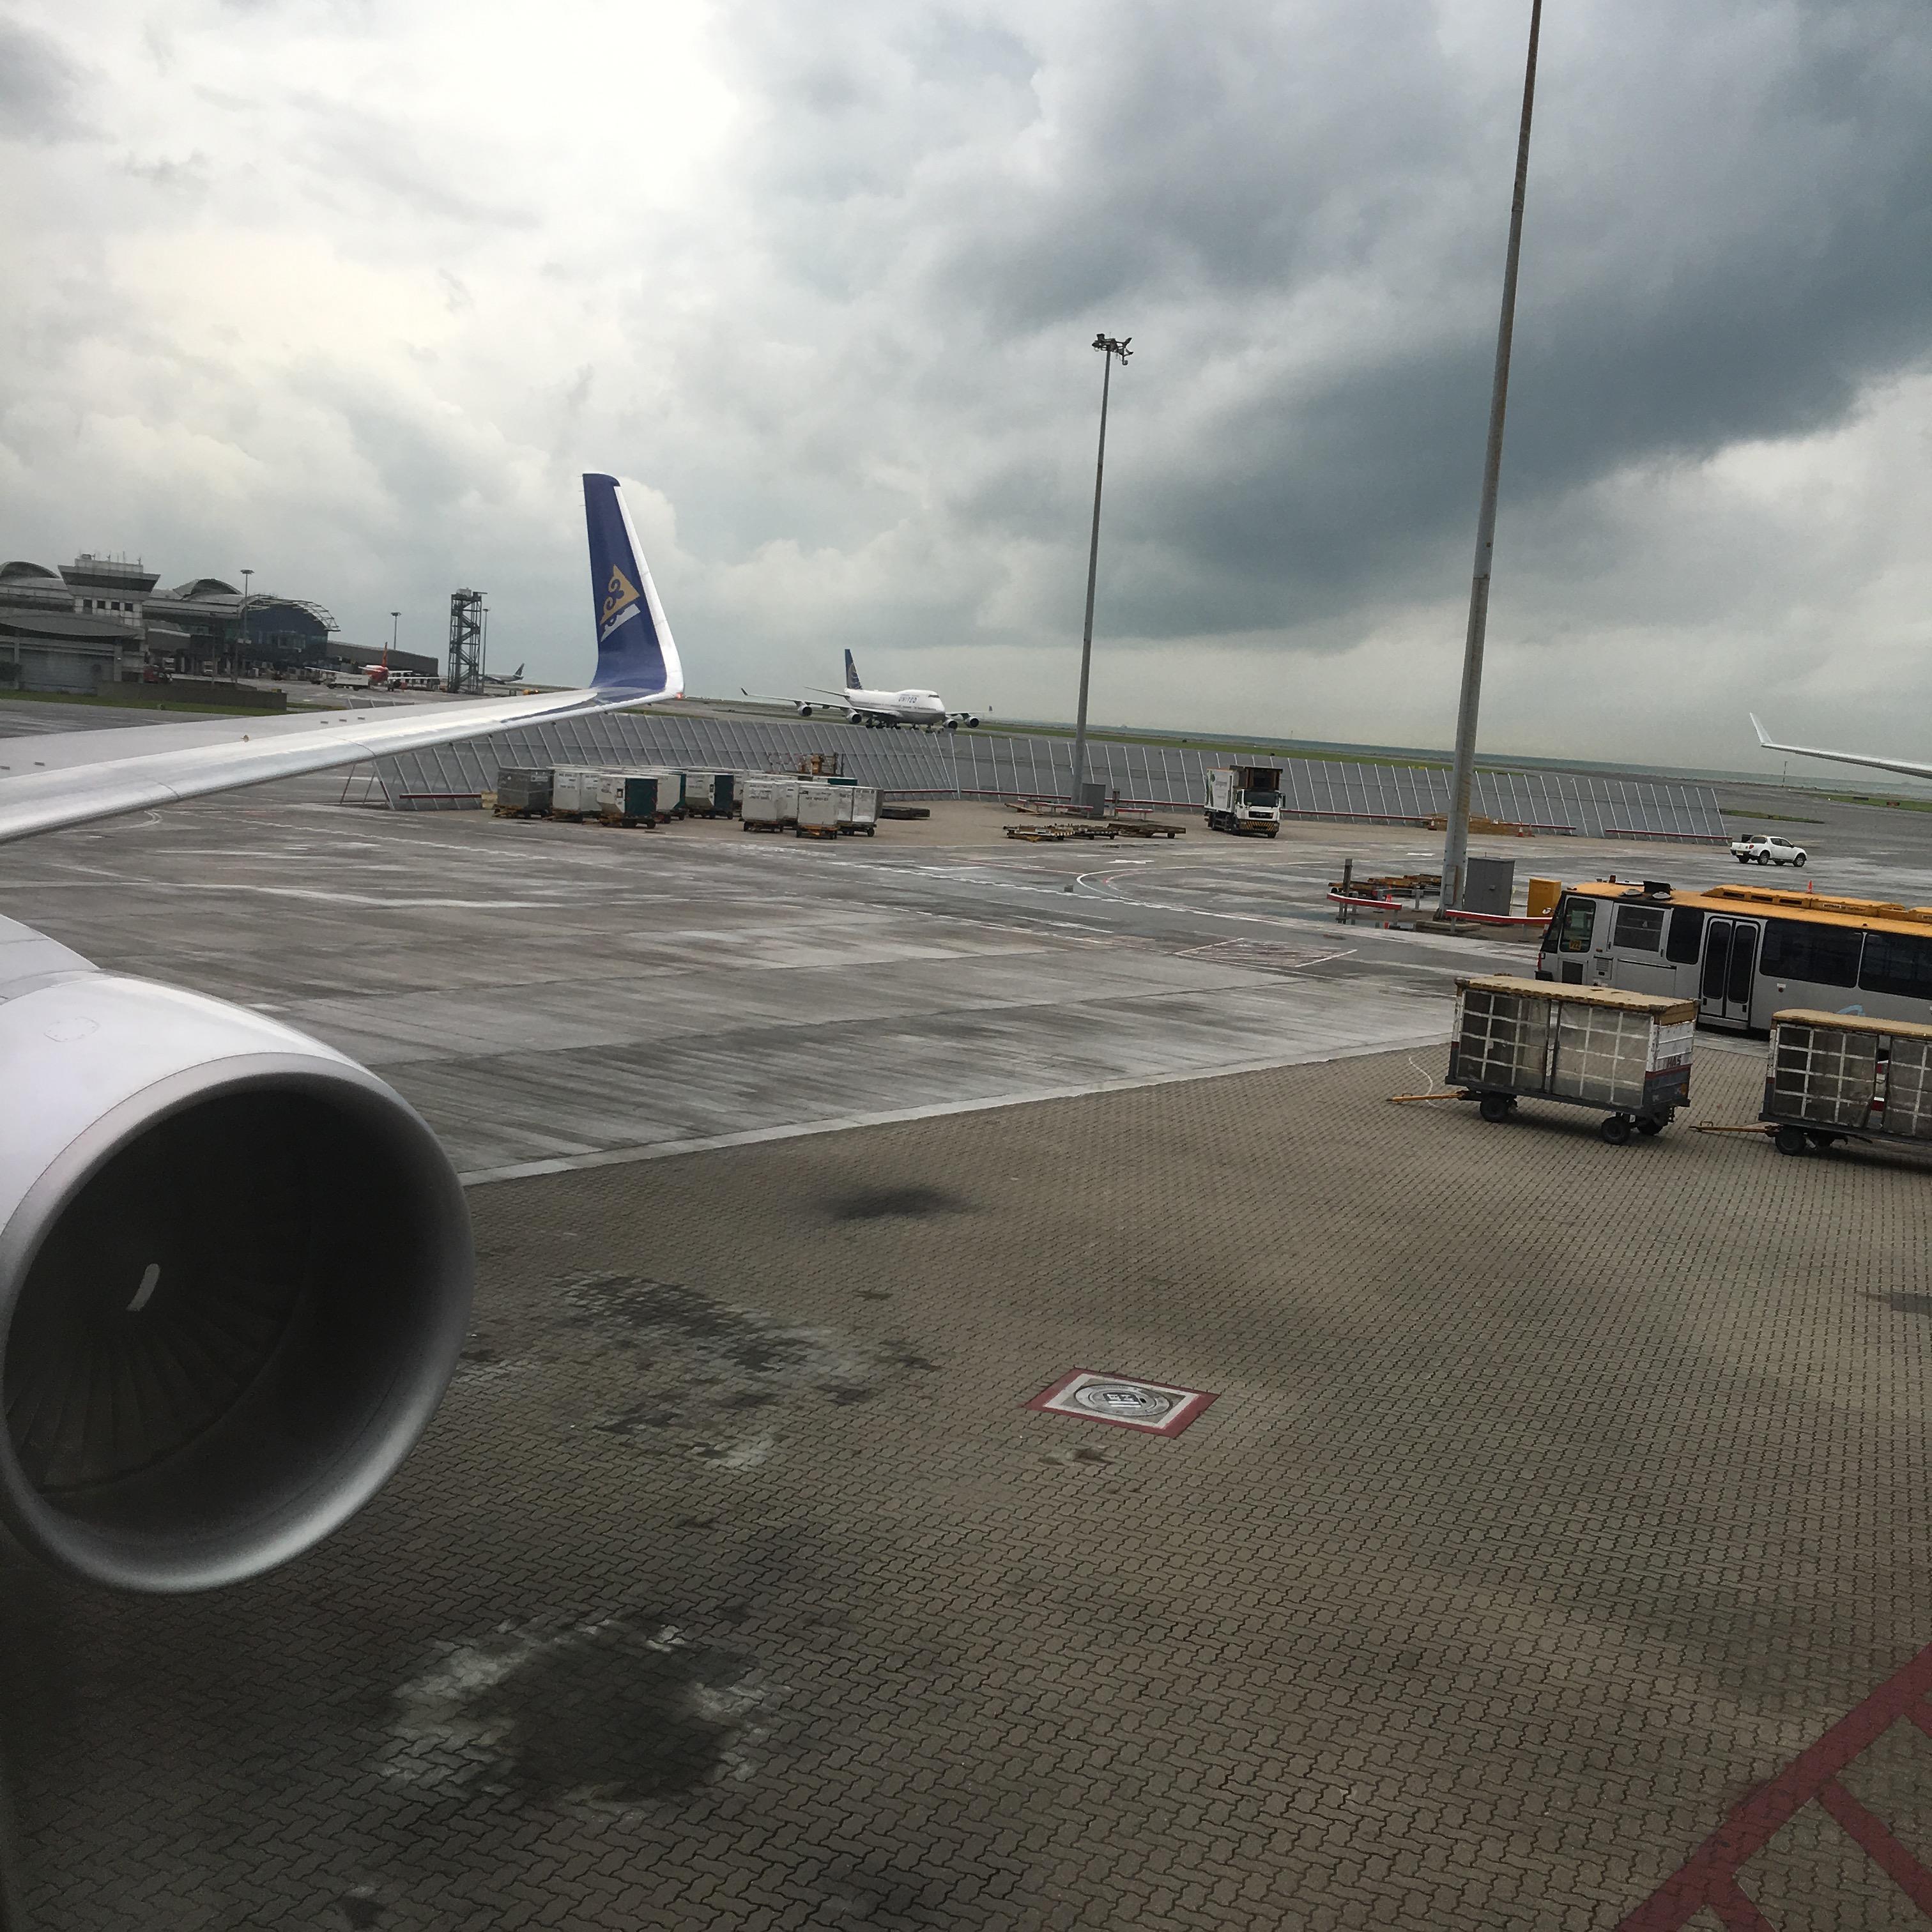 My last flight on Air Astana